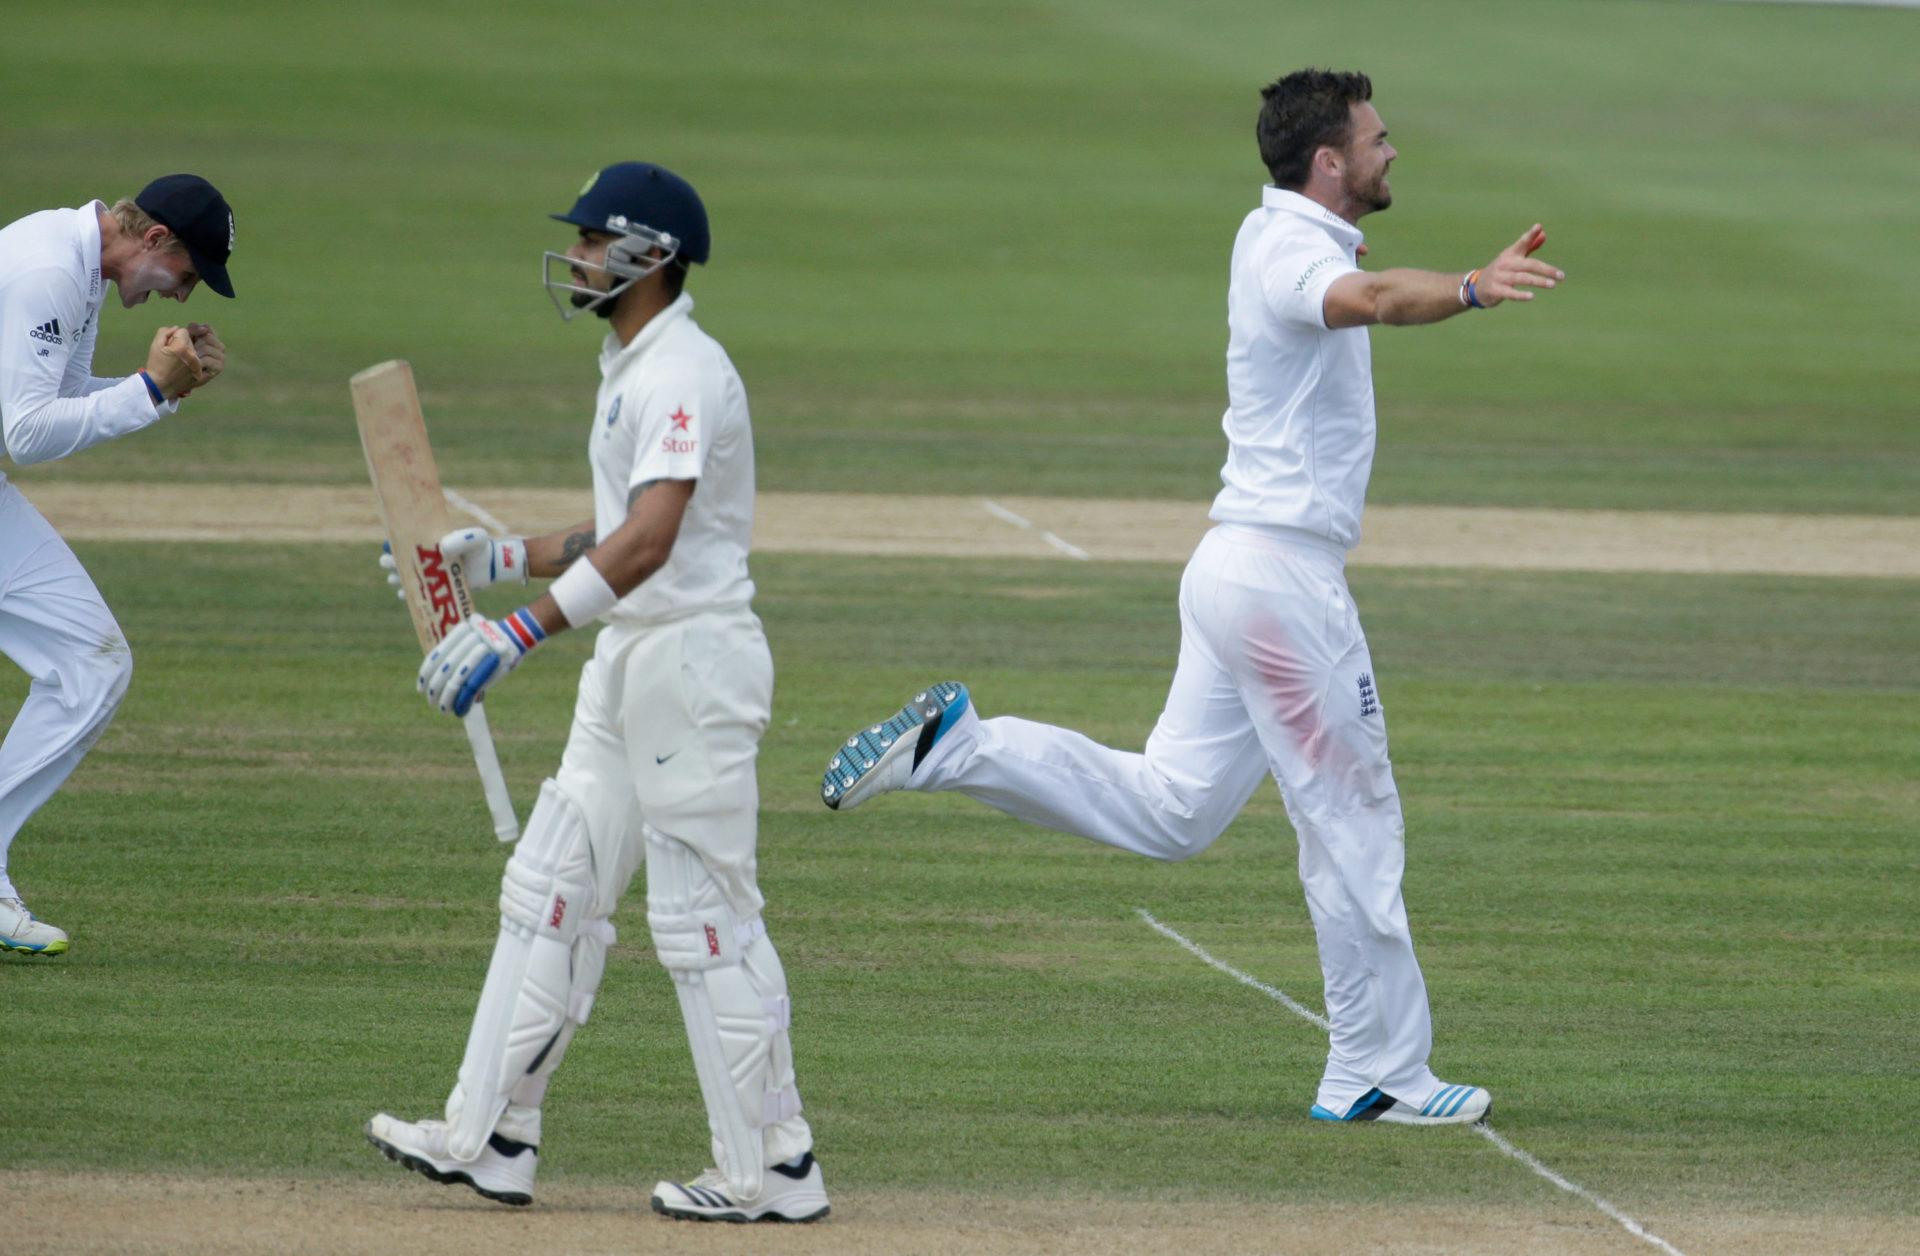 Joe Root's England Welcome Virat Kohli's India For Five-Test Showdown